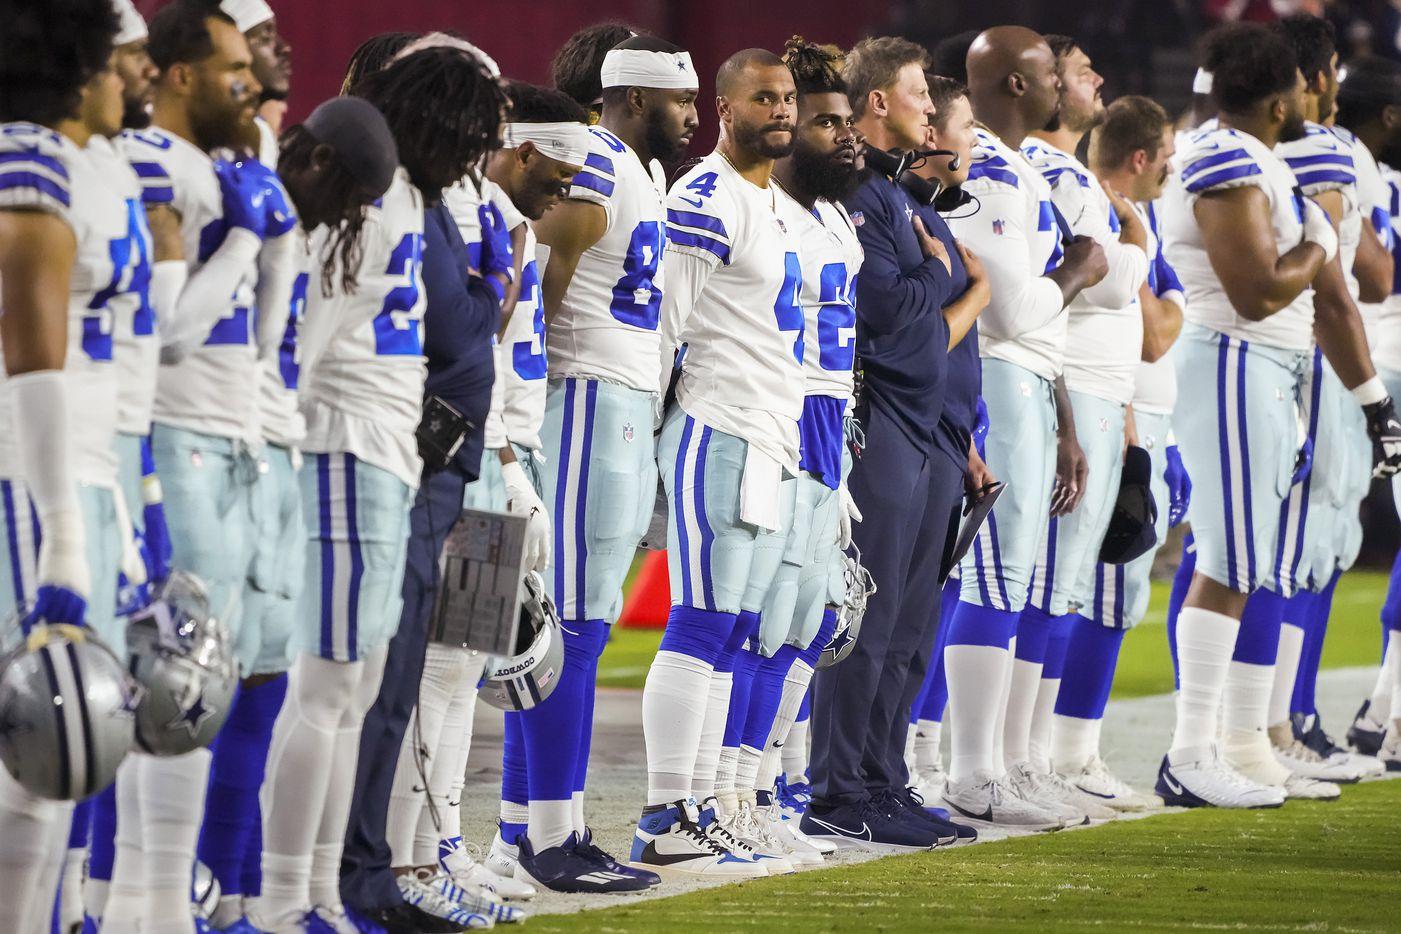 Dallas Cowboys quarterback Dak Prescott (4) and running back Ezekiel Elliott (21) stand for the national anthem with teammates before a preseason NFL football game at State Farm Stadium on Friday, Aug. 13, 2021, in Glendale, Ariz.